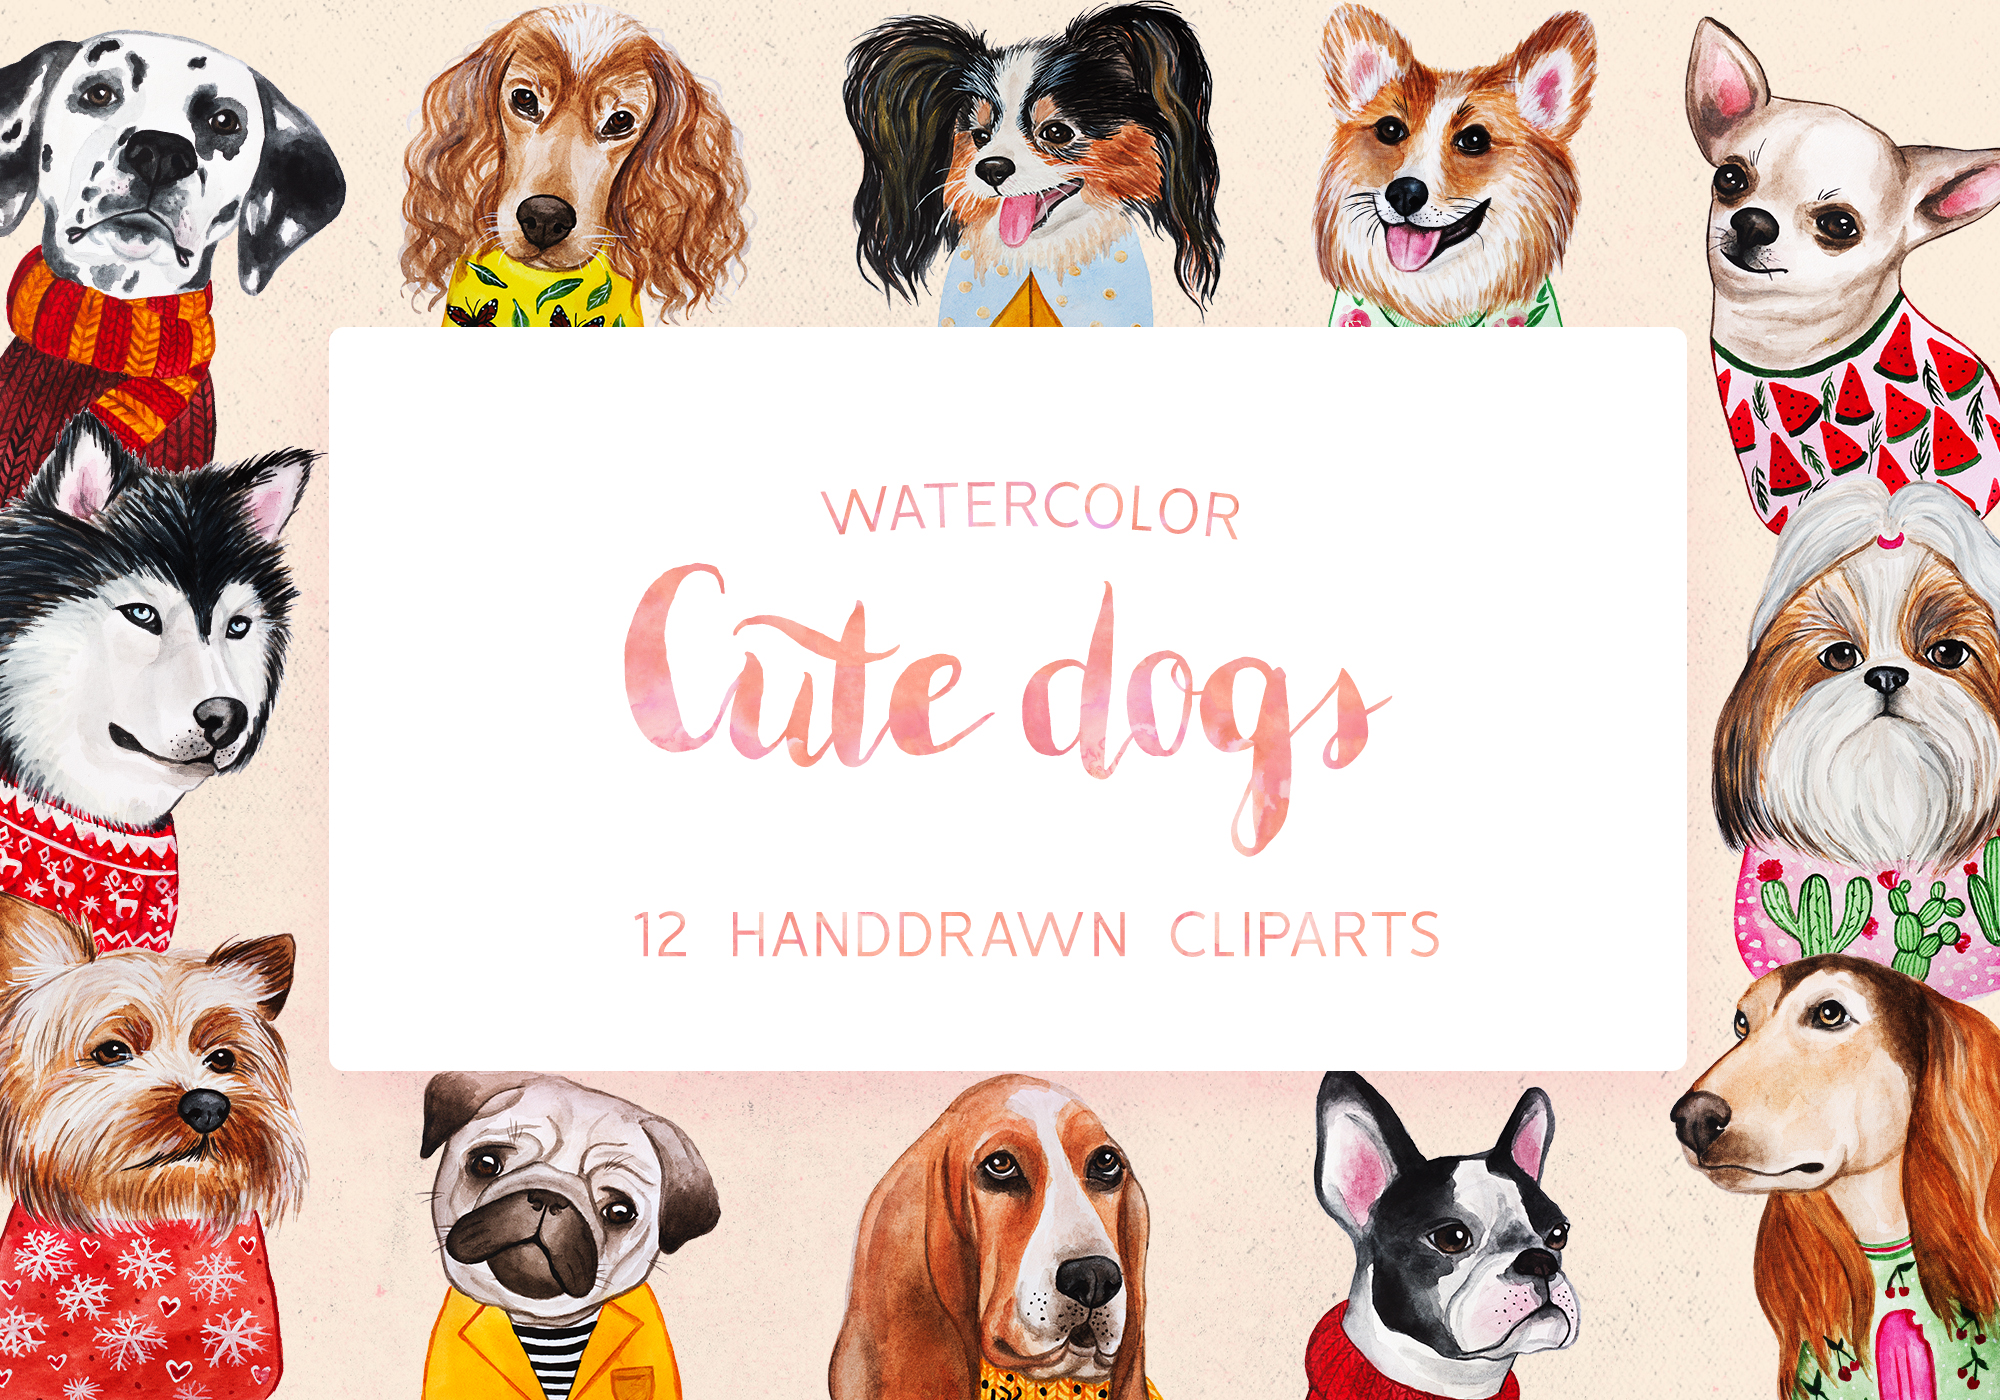 Watercolor Cute Dogs+Calendar example image 1